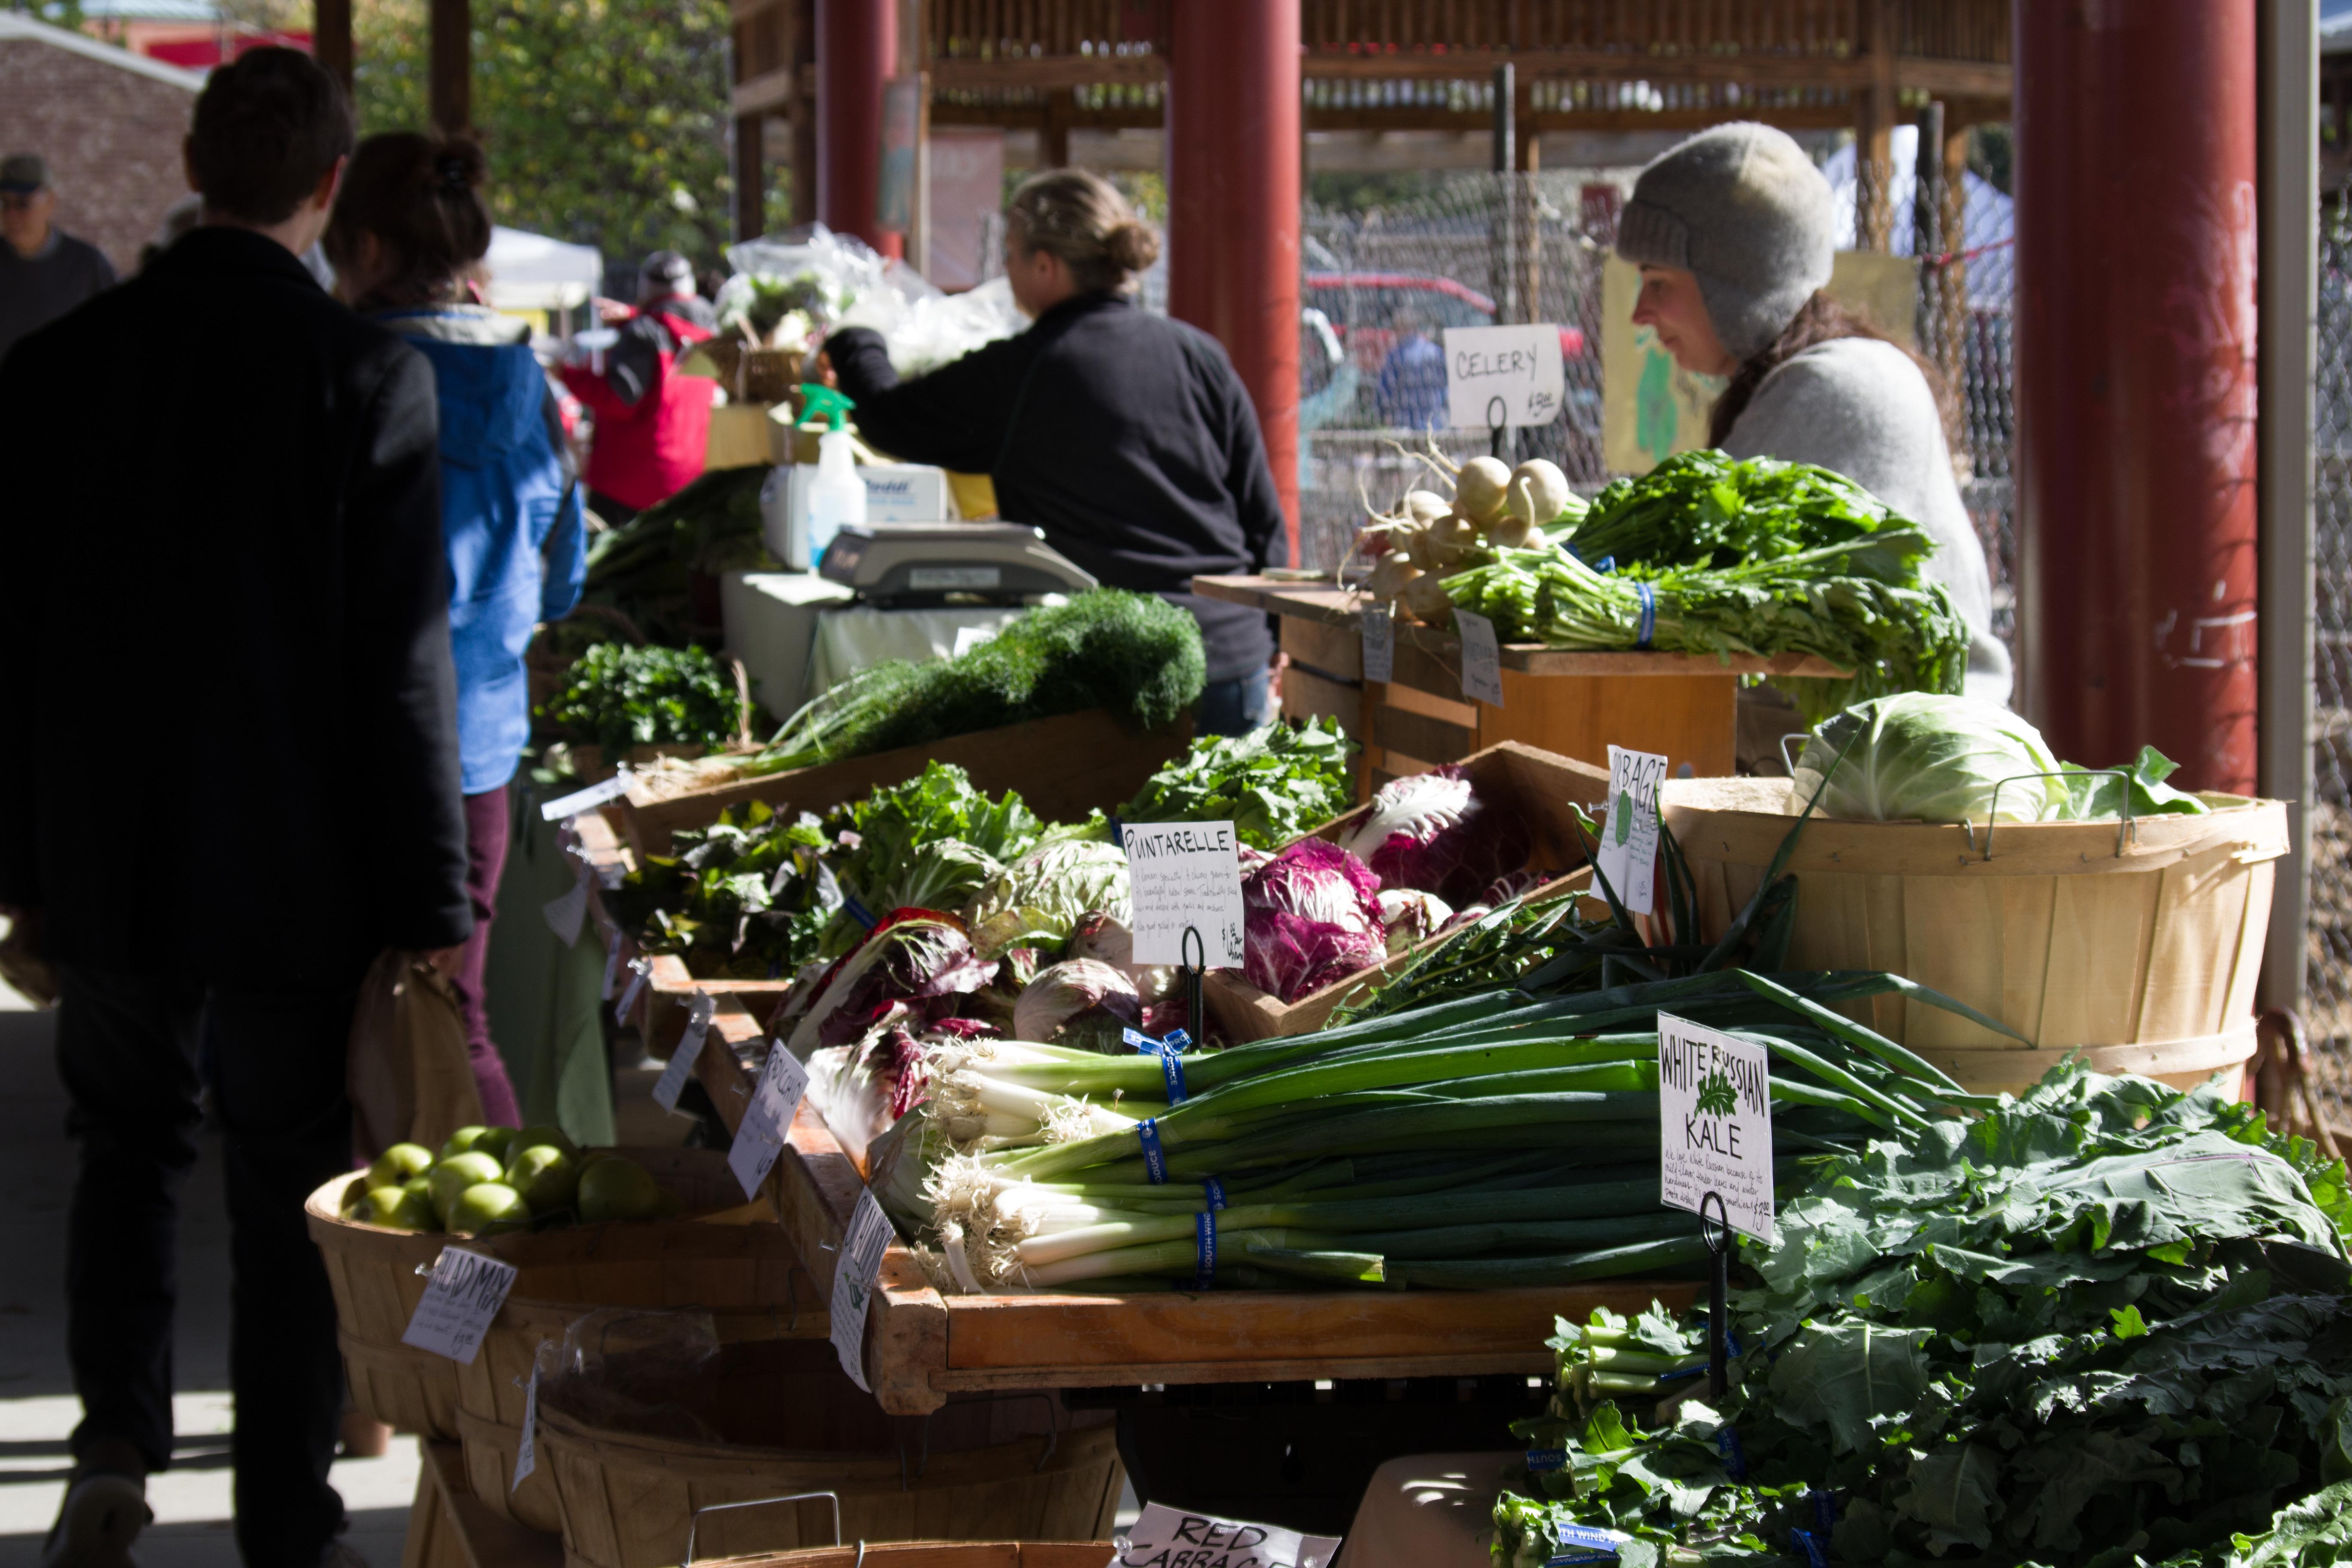 public health accreditation board healthy food programs systems health equity